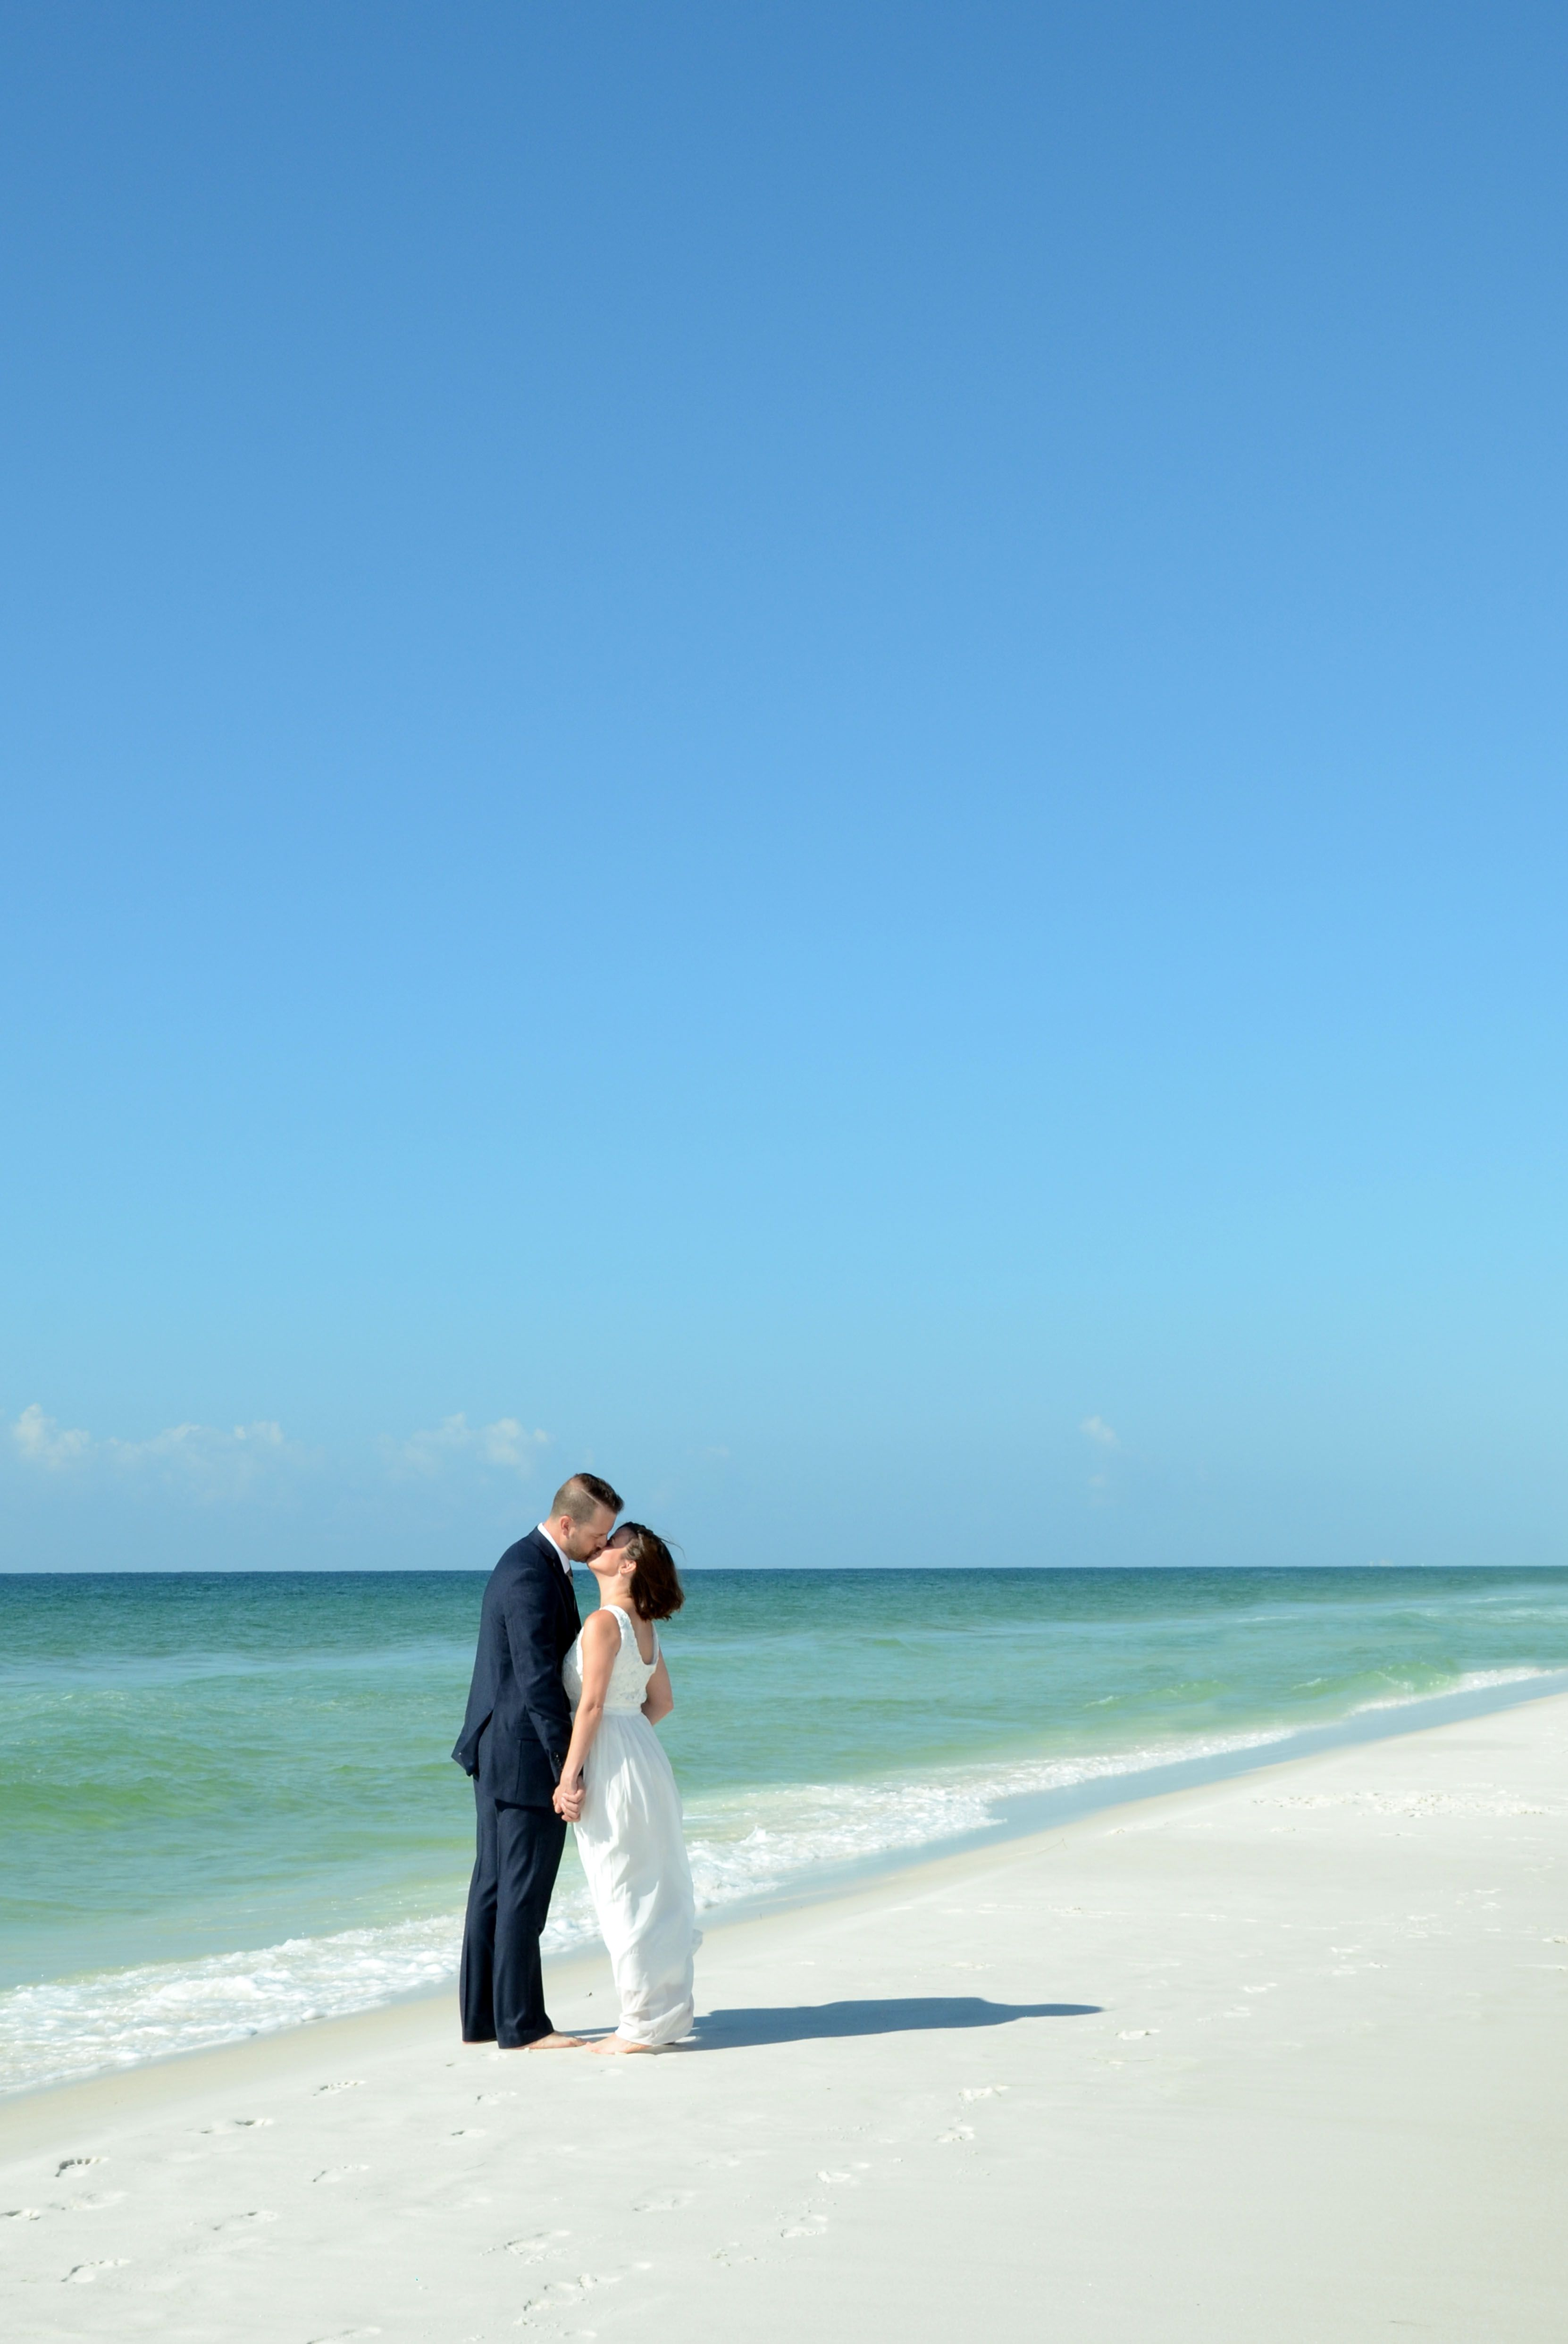 Morning Light Okaloosa Island Fort Walton Beach Florida Destination Beach Wedding Beach Beach Destination Wedding Sunset Beach Weddings